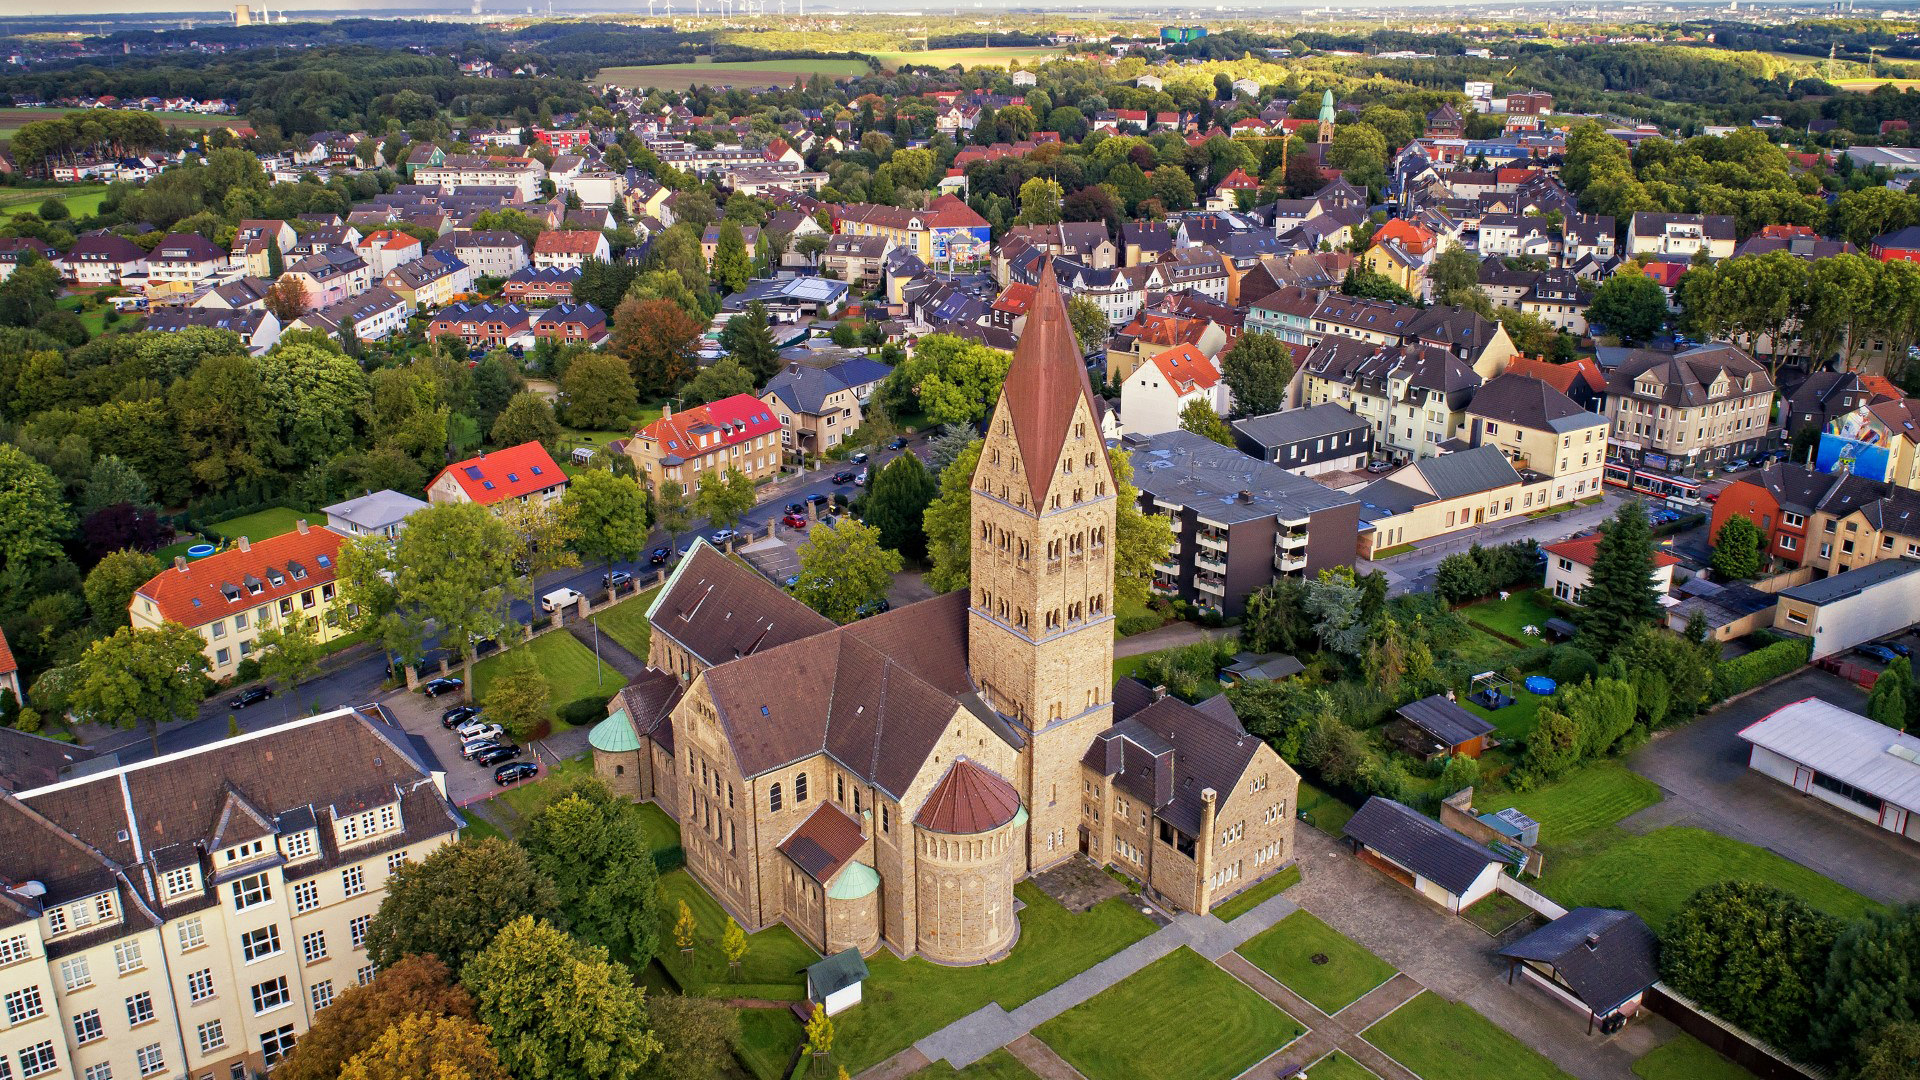 St. Elisabeth Bochum